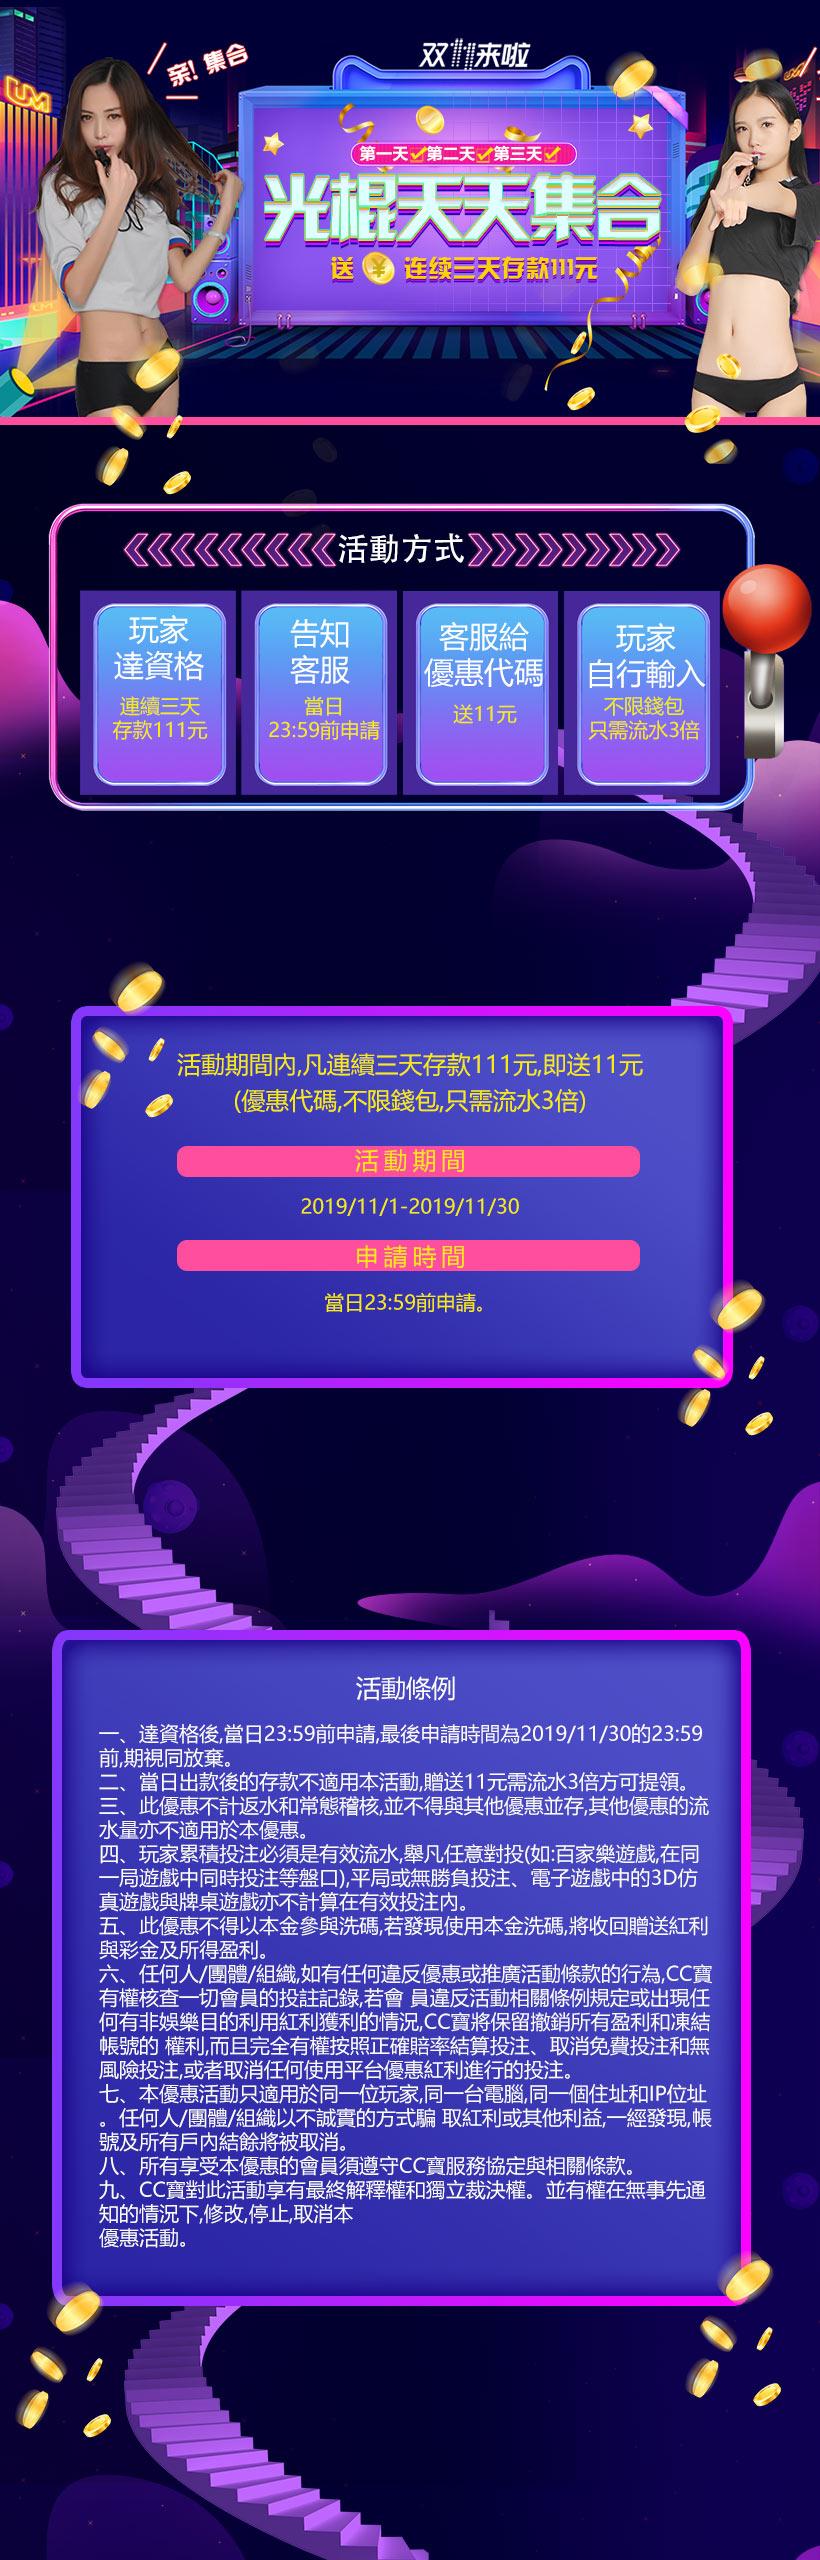 cc宝 cc集团 光棍节 送钱 北京赛车 六合彩计画